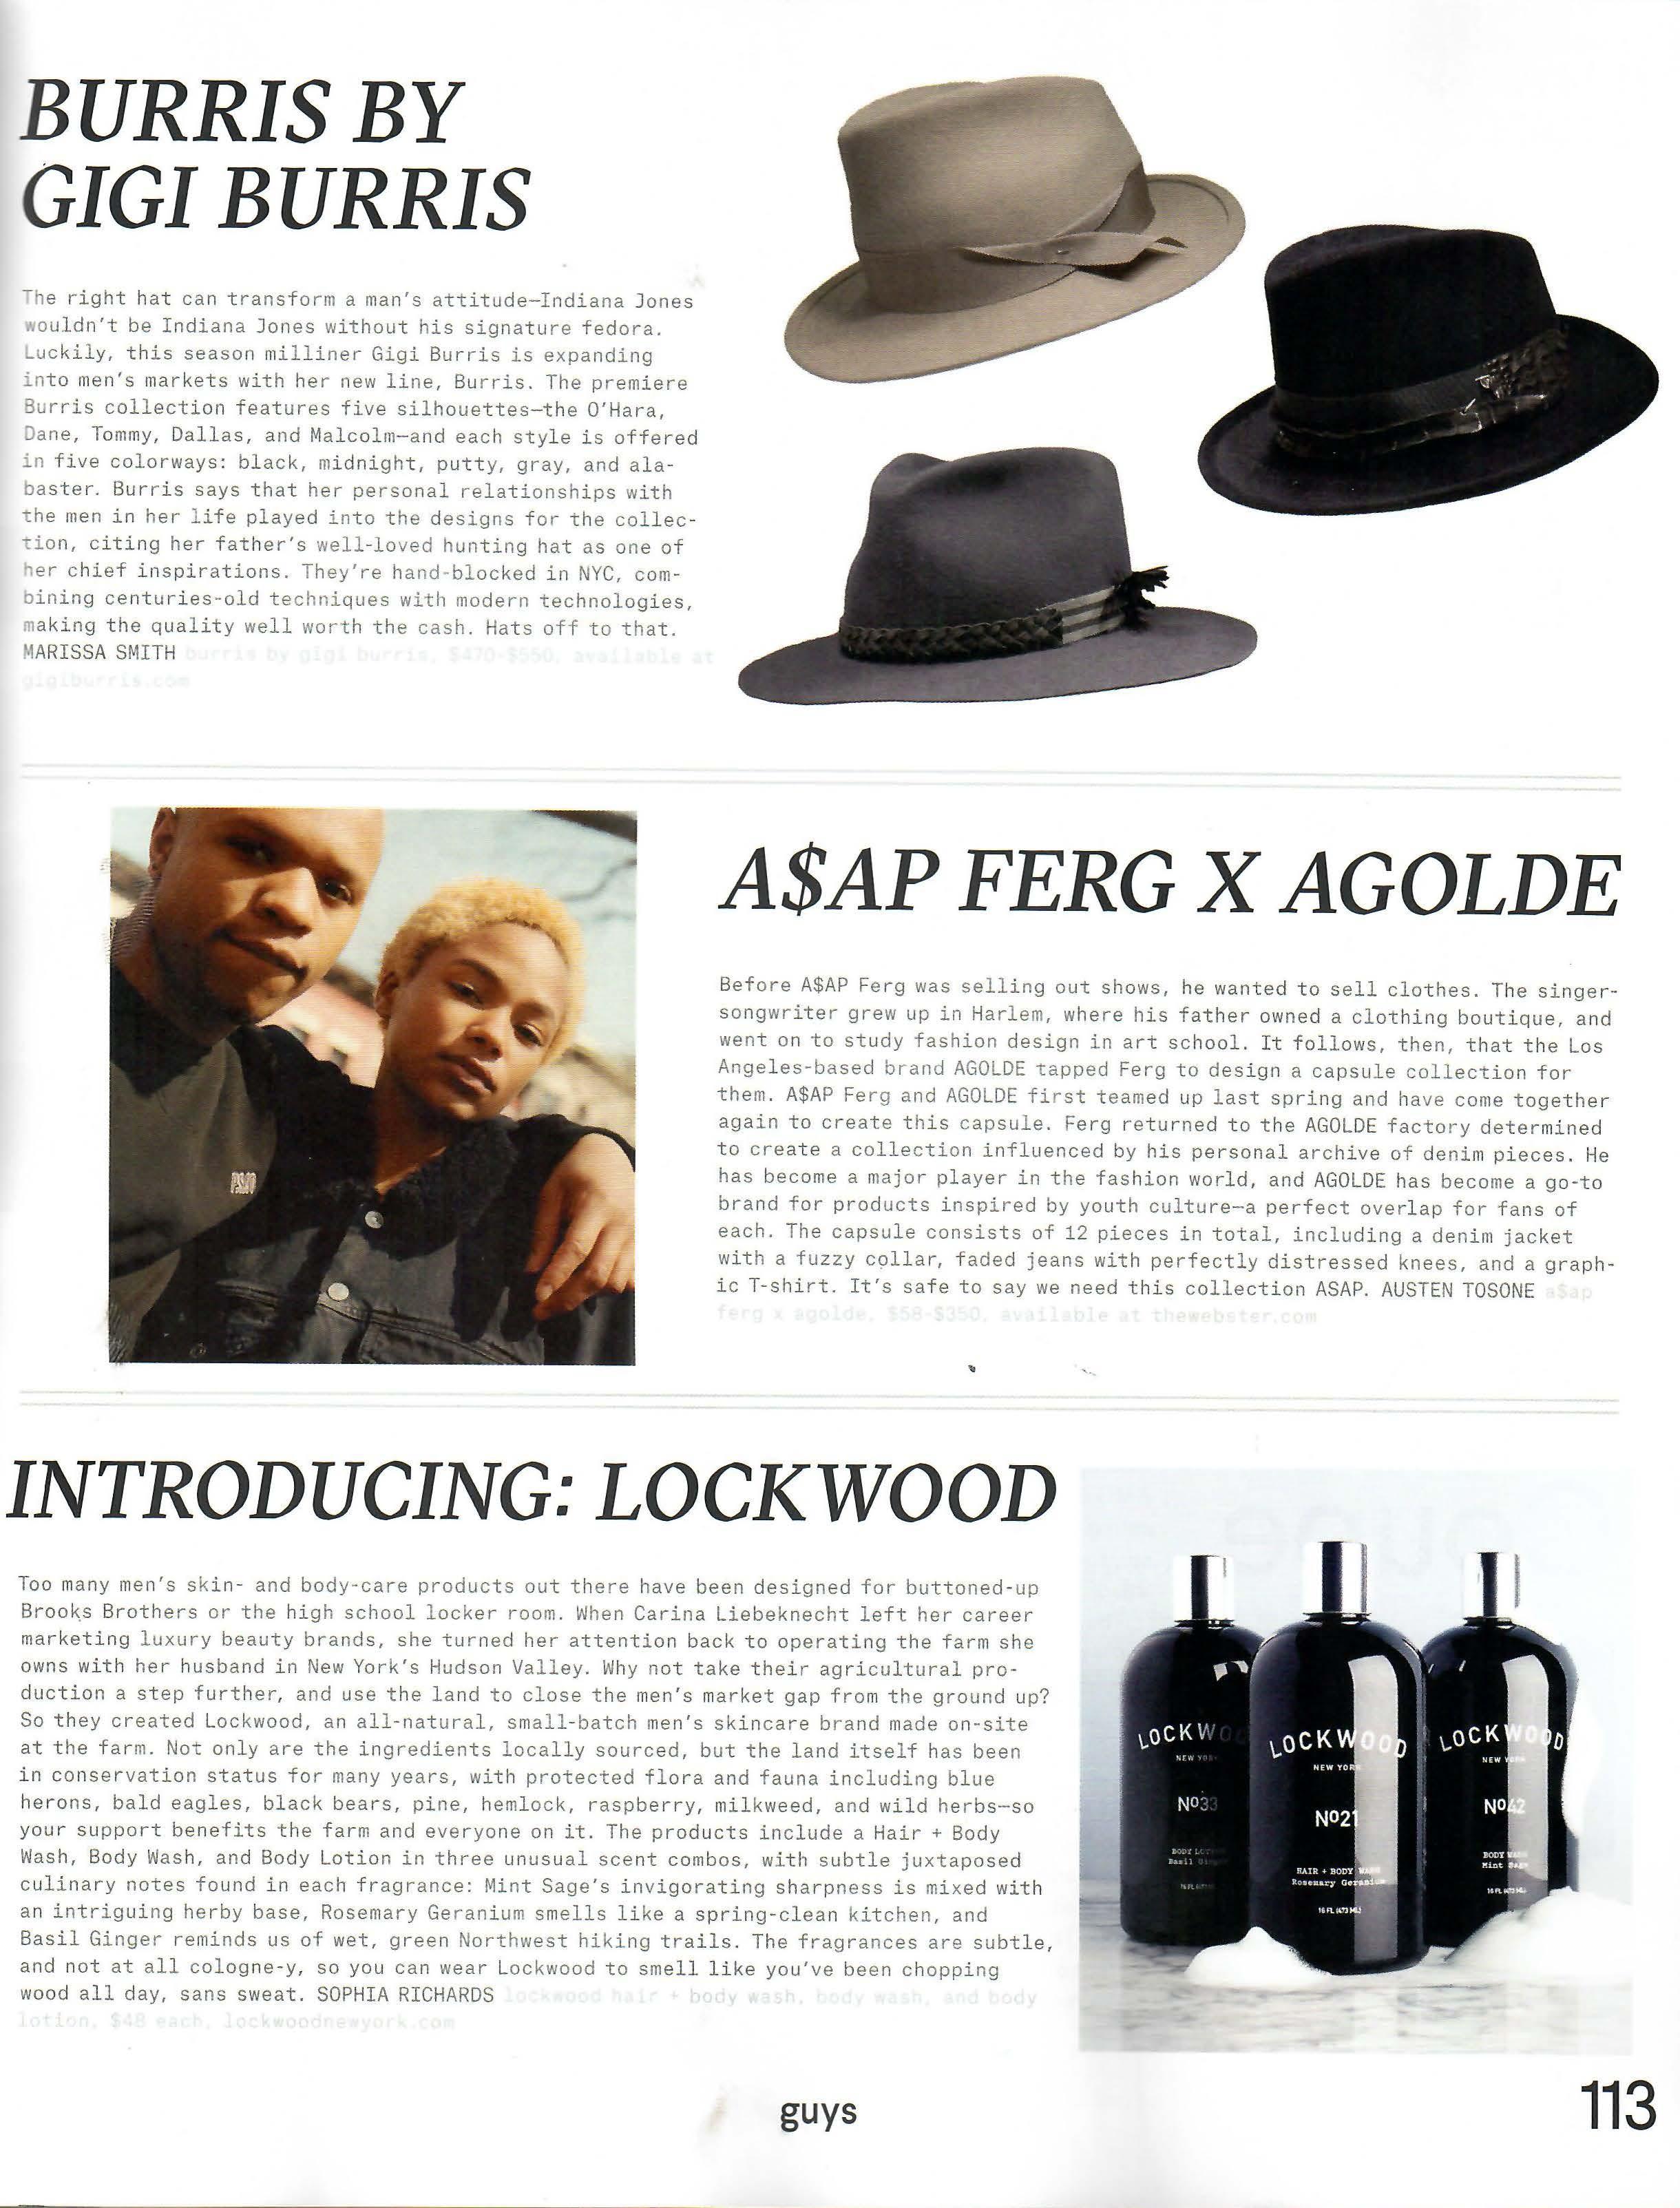 Nylon Boys: Introducing Lockwood